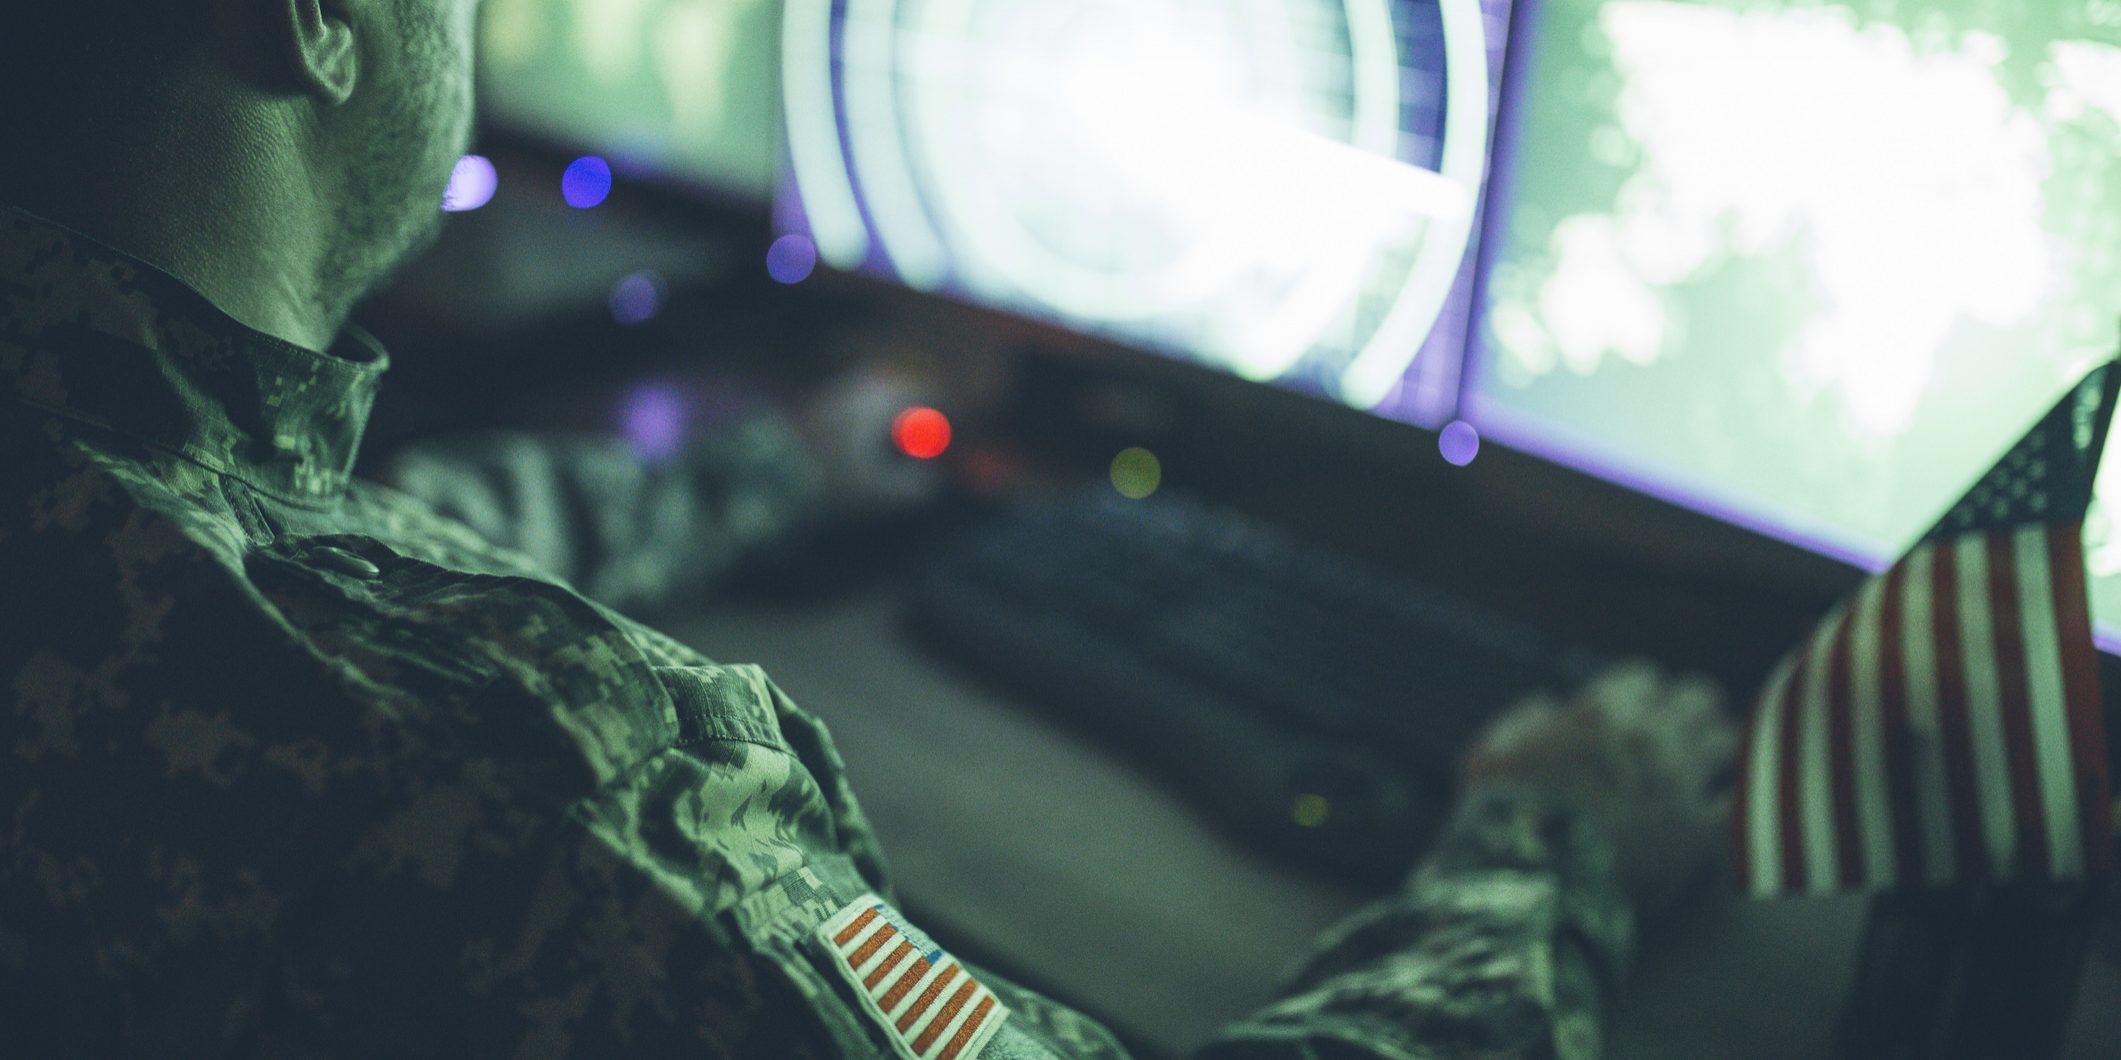 American soldier in headquarter control center